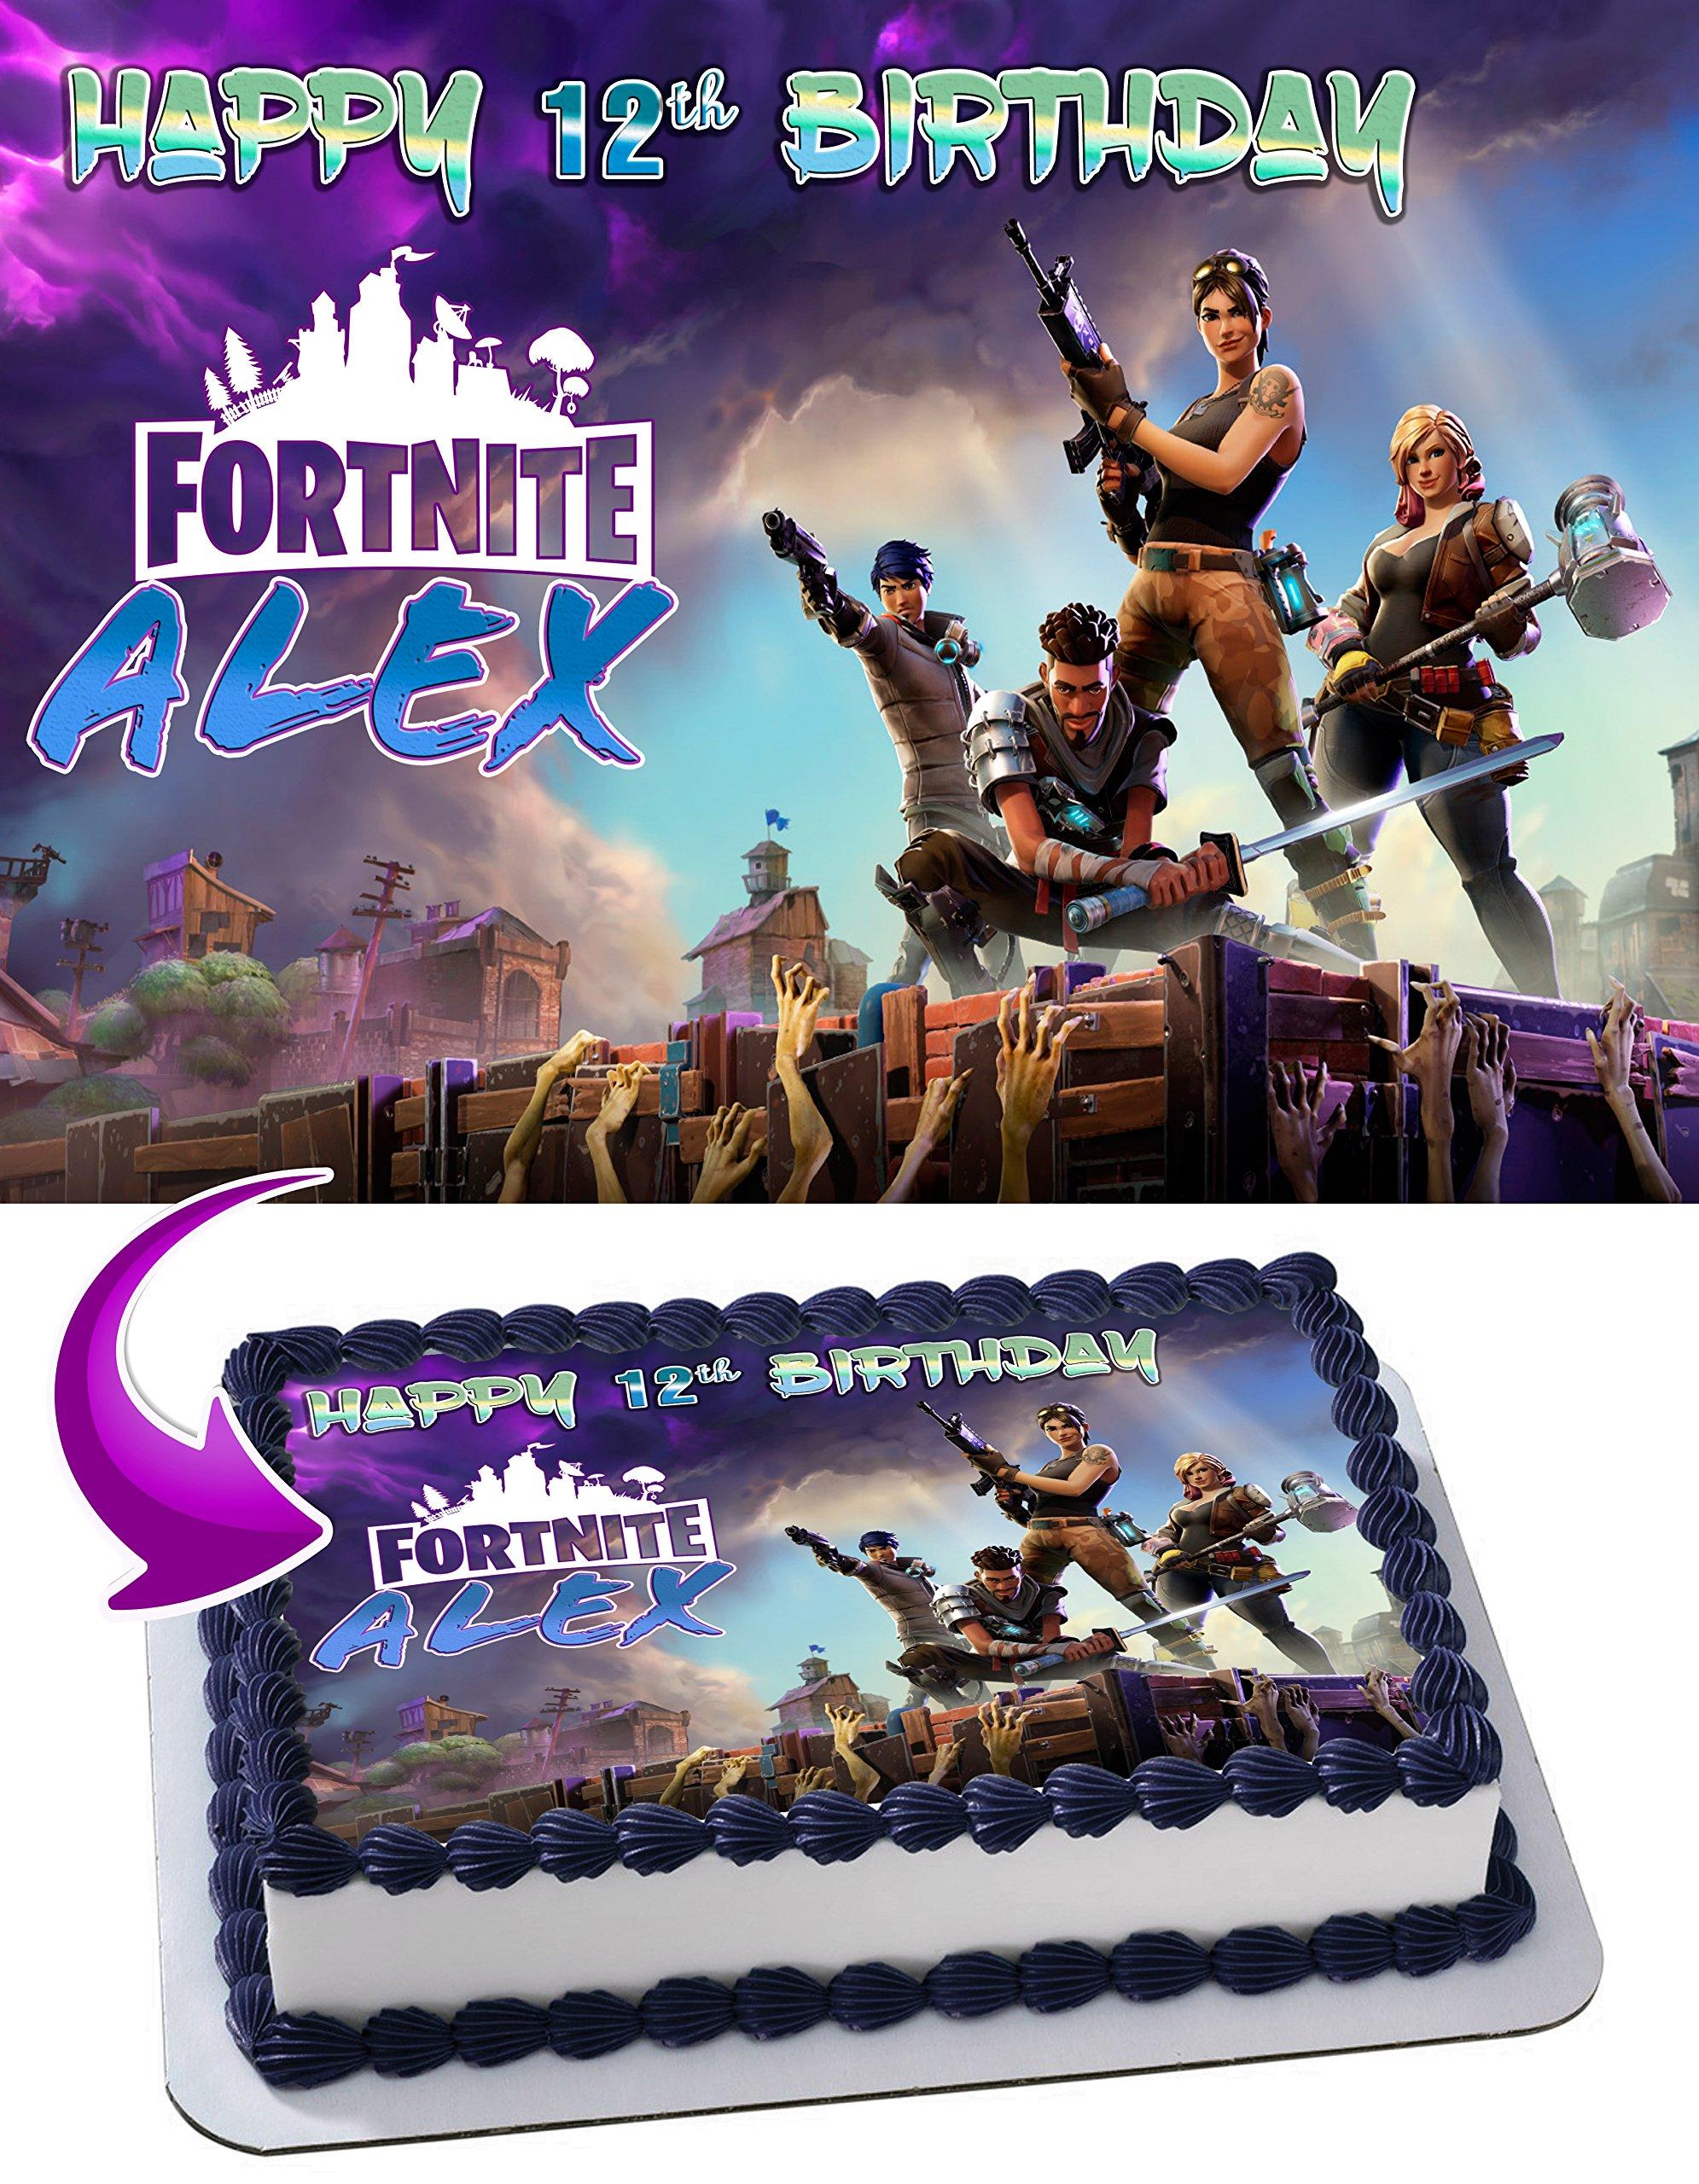 Fortnite Battle Royale Edible Image Cake Topper Personalized Birthday 1/4 Sheet Decoration Custom Sheet Party Birthday Sugar Frosting Transfer Fondant Image ~ Best Quality Edible Image for cake